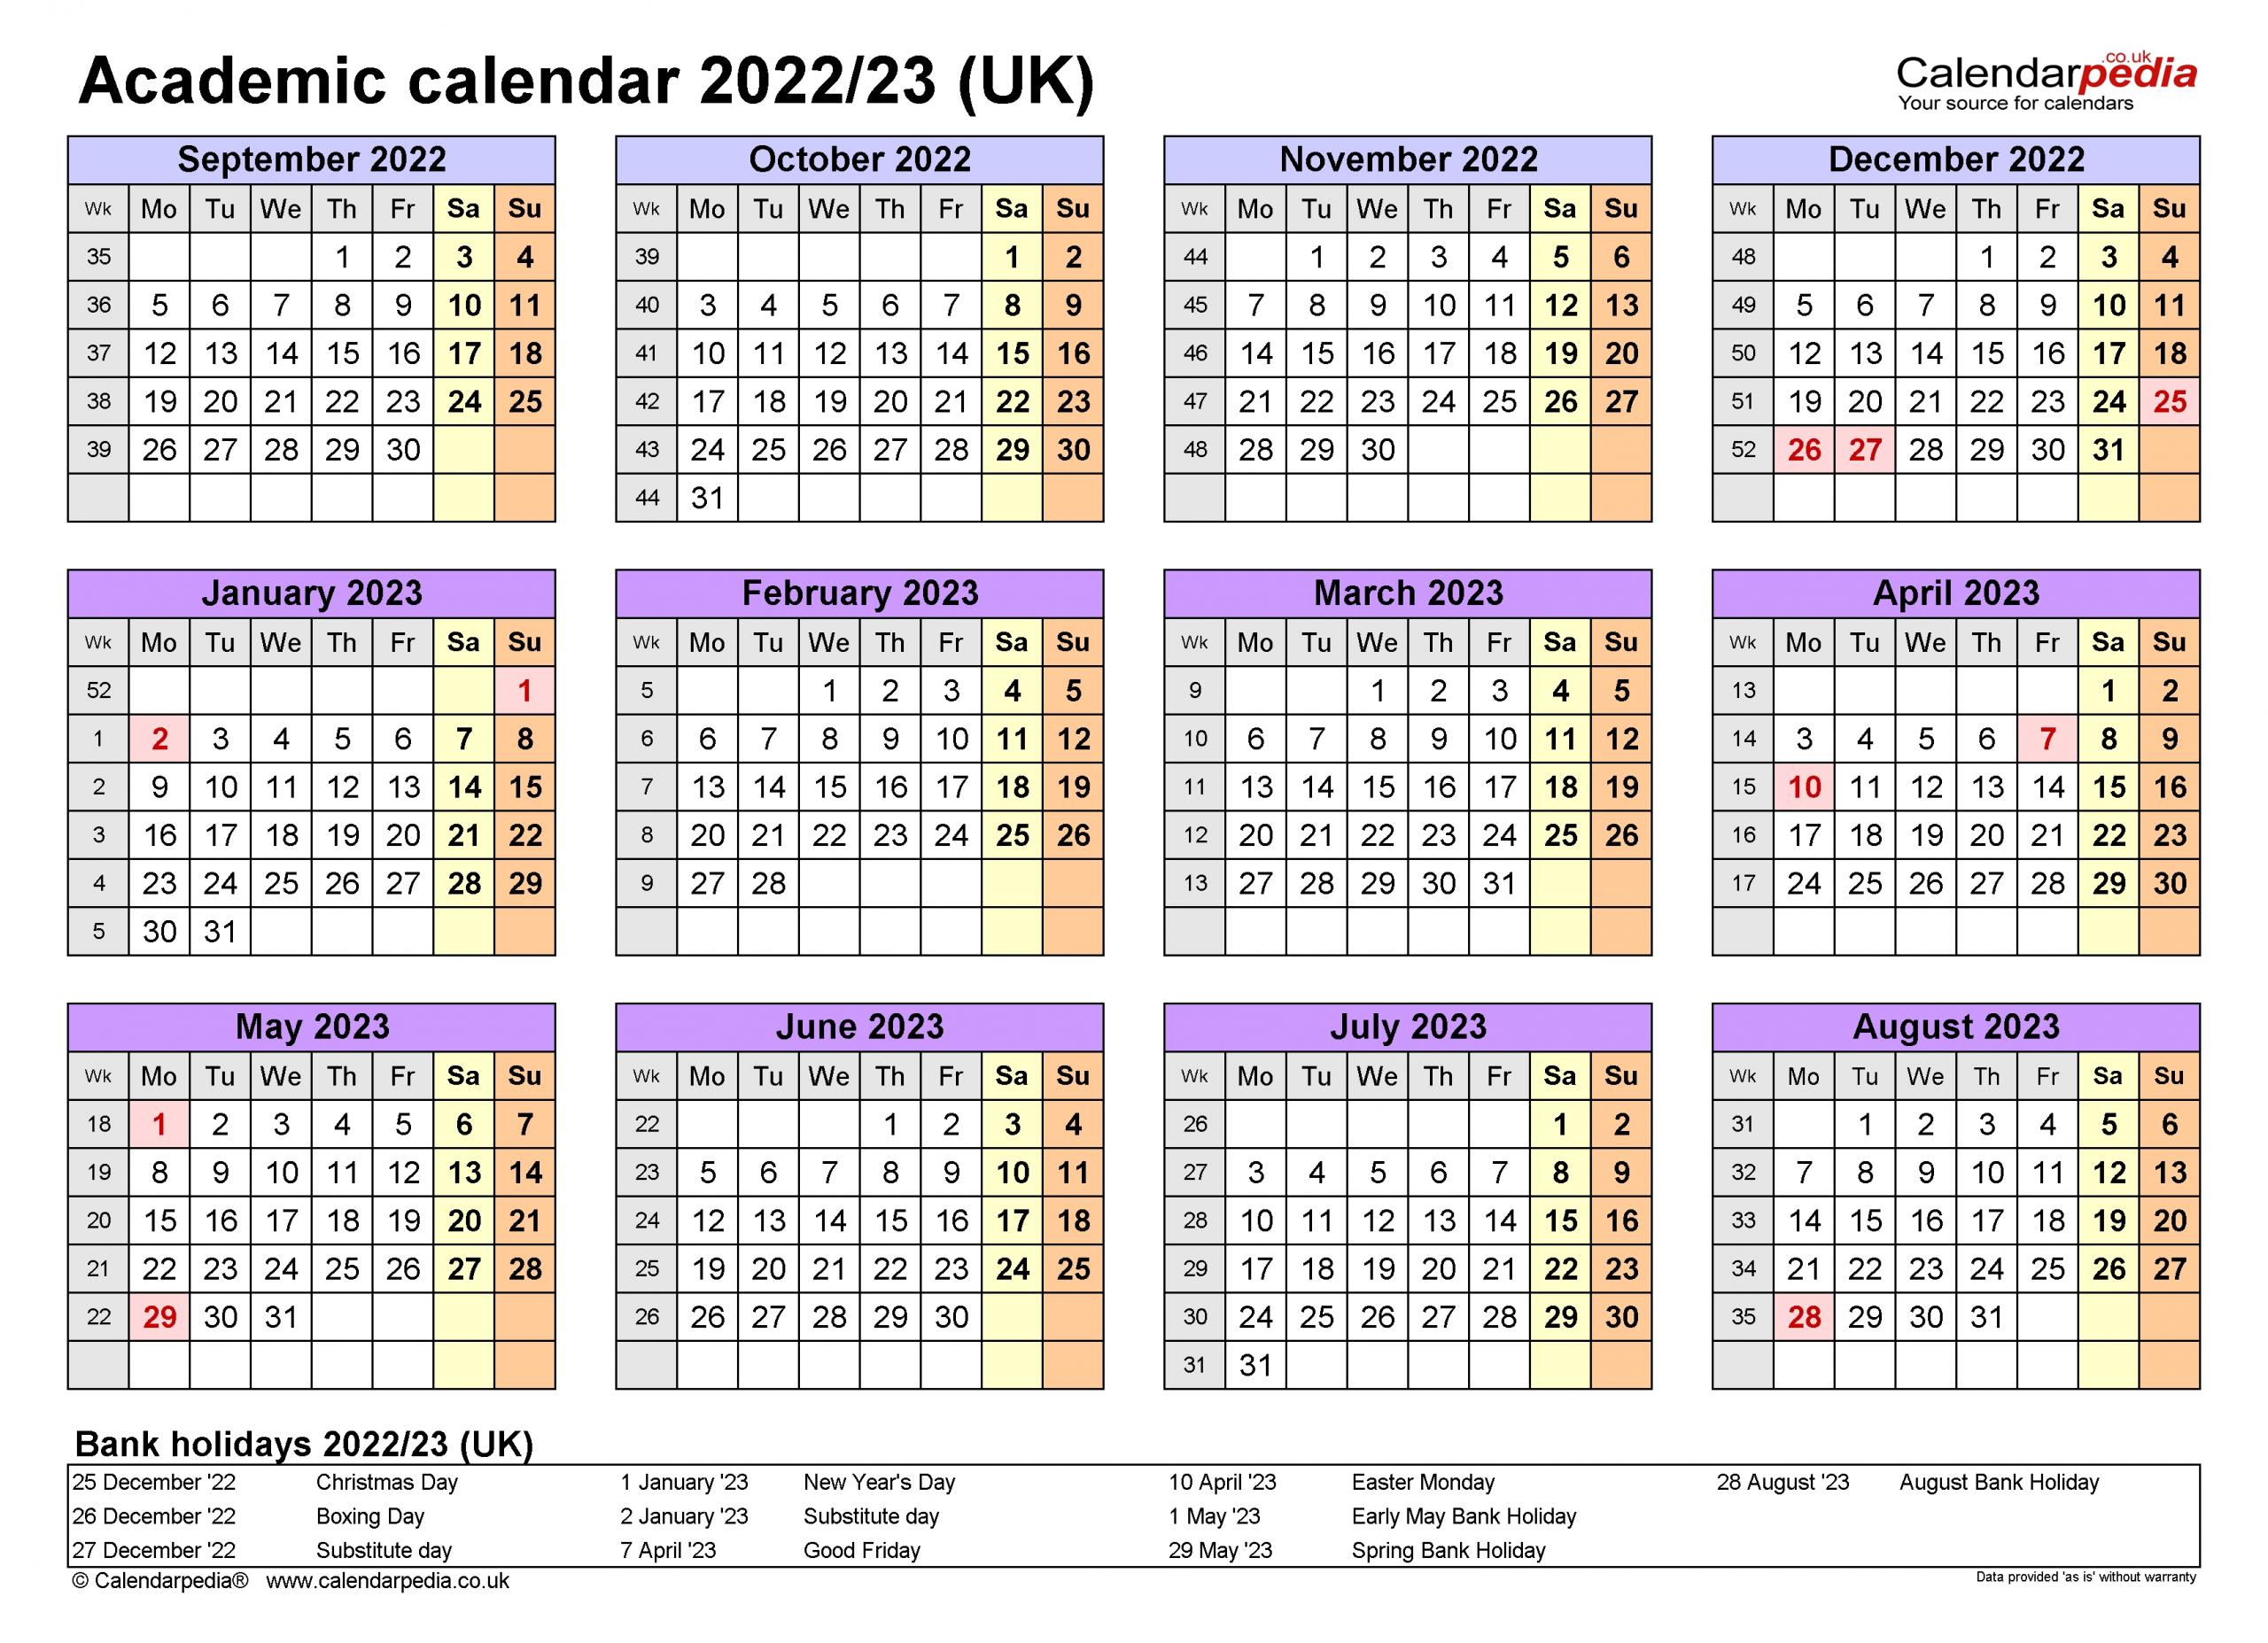 Academic Calendars 2022/23 Uk - Free Printable Pdf Templates